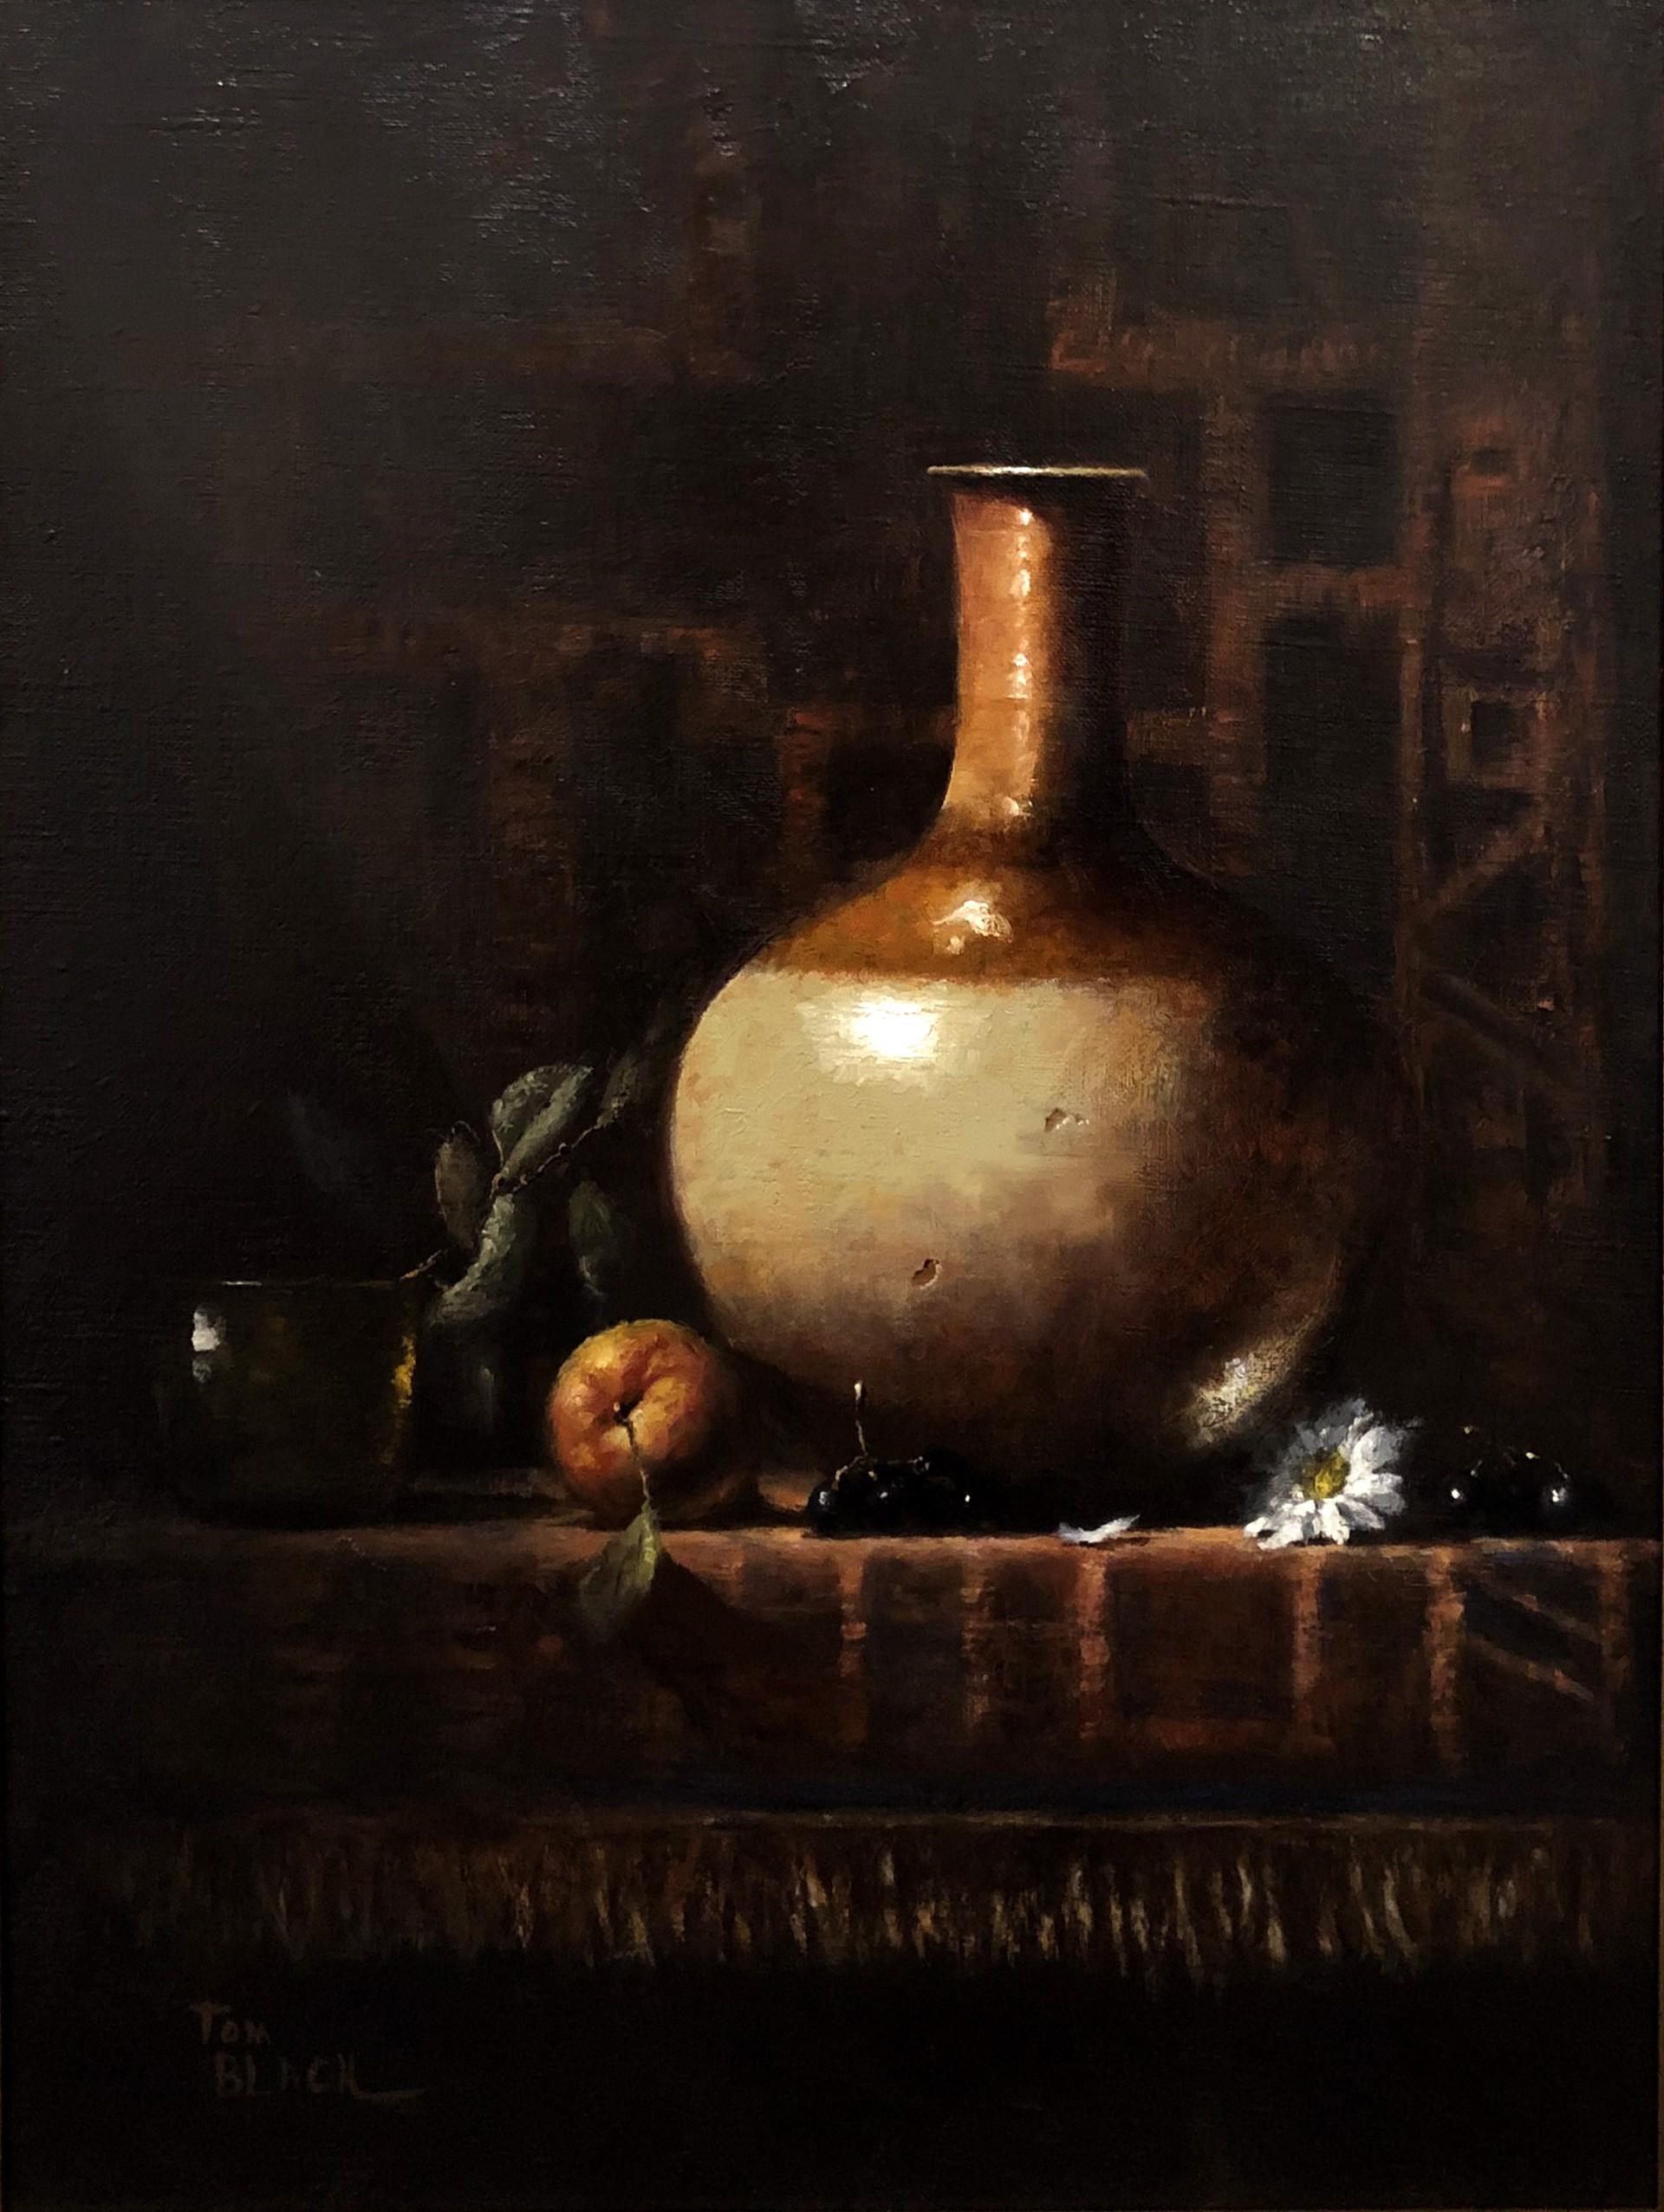 Still Life with Vase by Tom Black